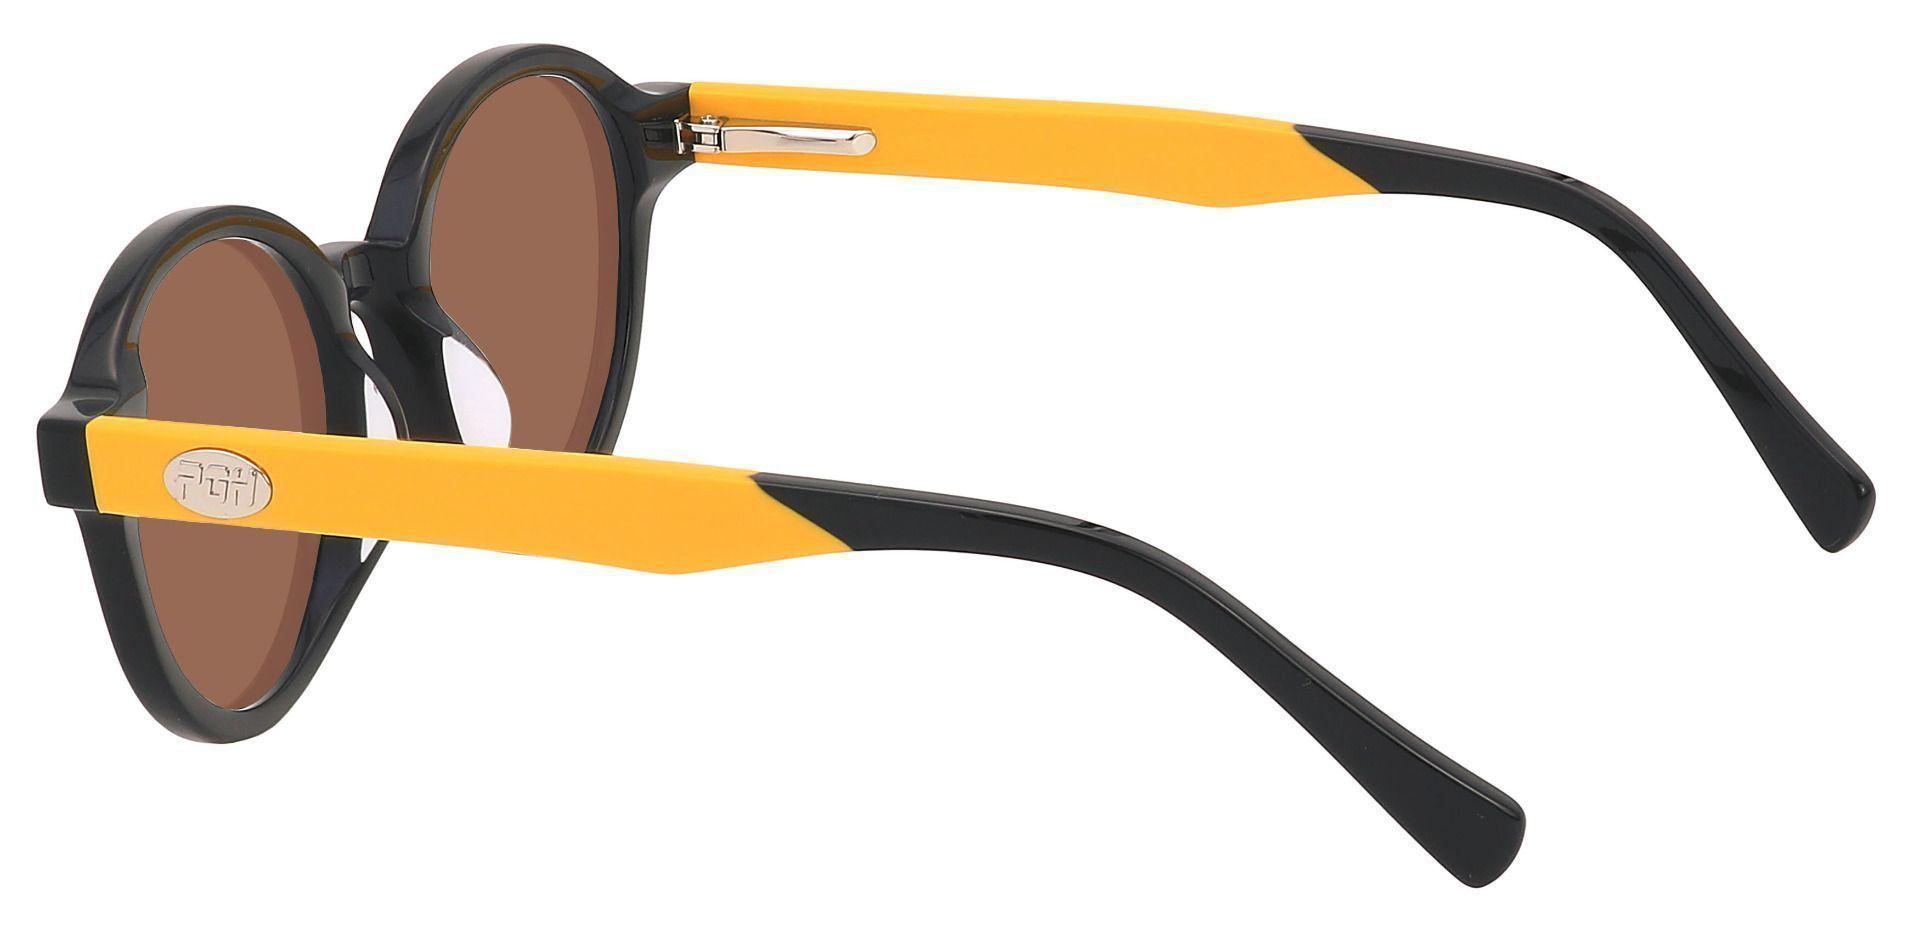 Champ Round Reading Sunglasses - Black Frame With Brown Lenses